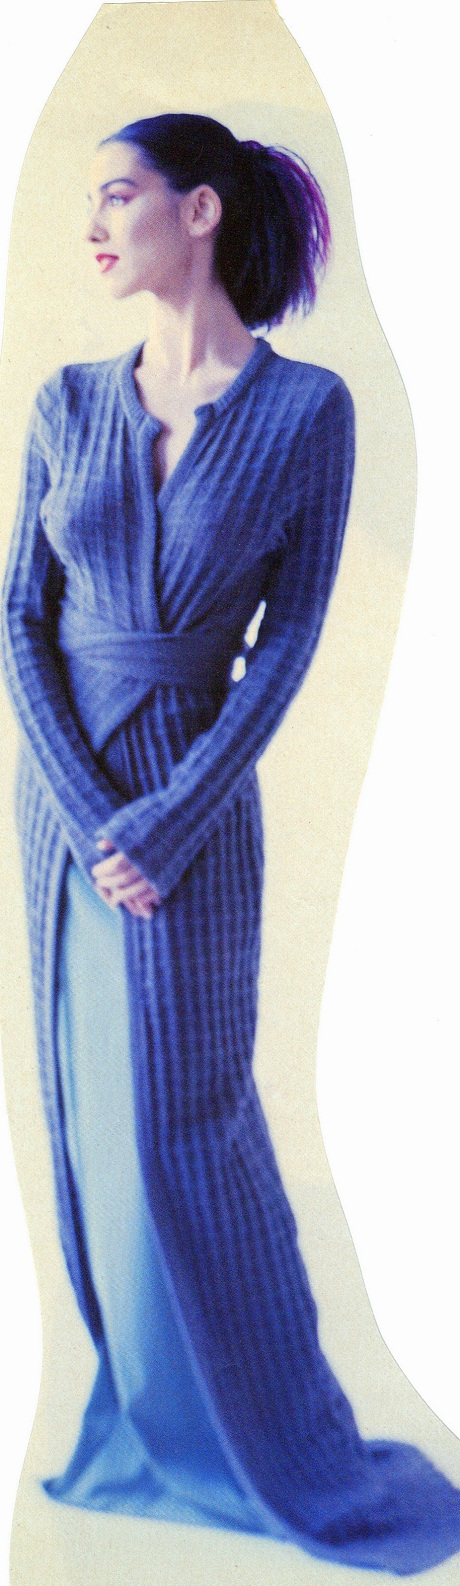 Mimi Bizjak Floor-length 1990s Sweater on Exshoesme.com